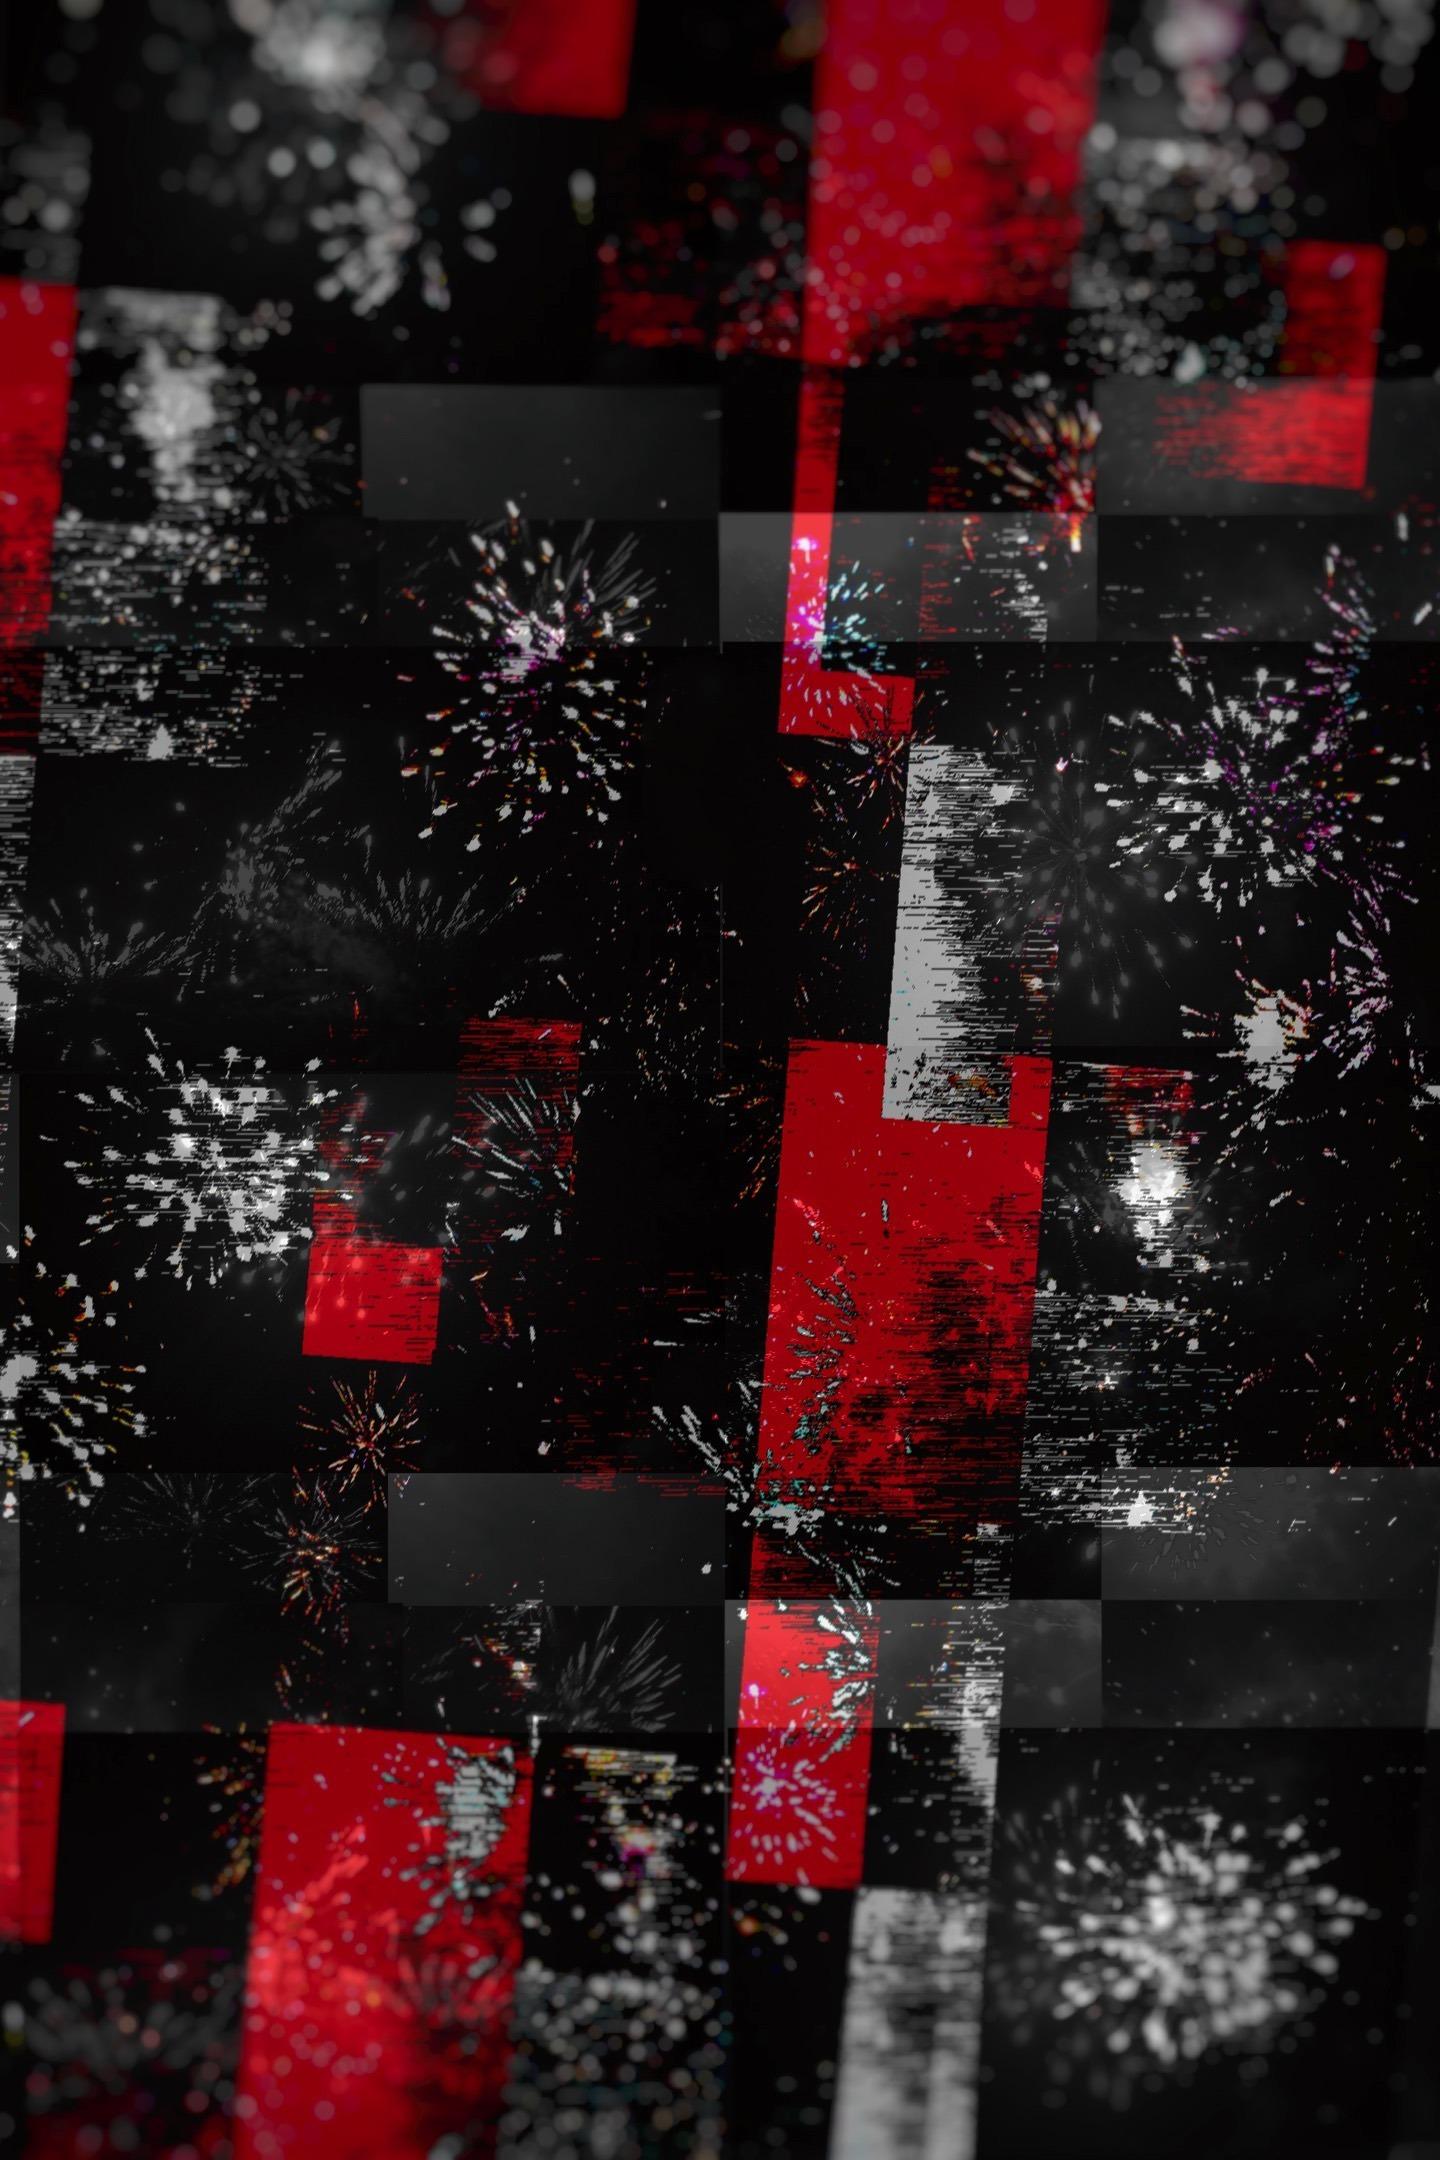 Download 1440x2960 wallpaper glitch art, abstract, dark